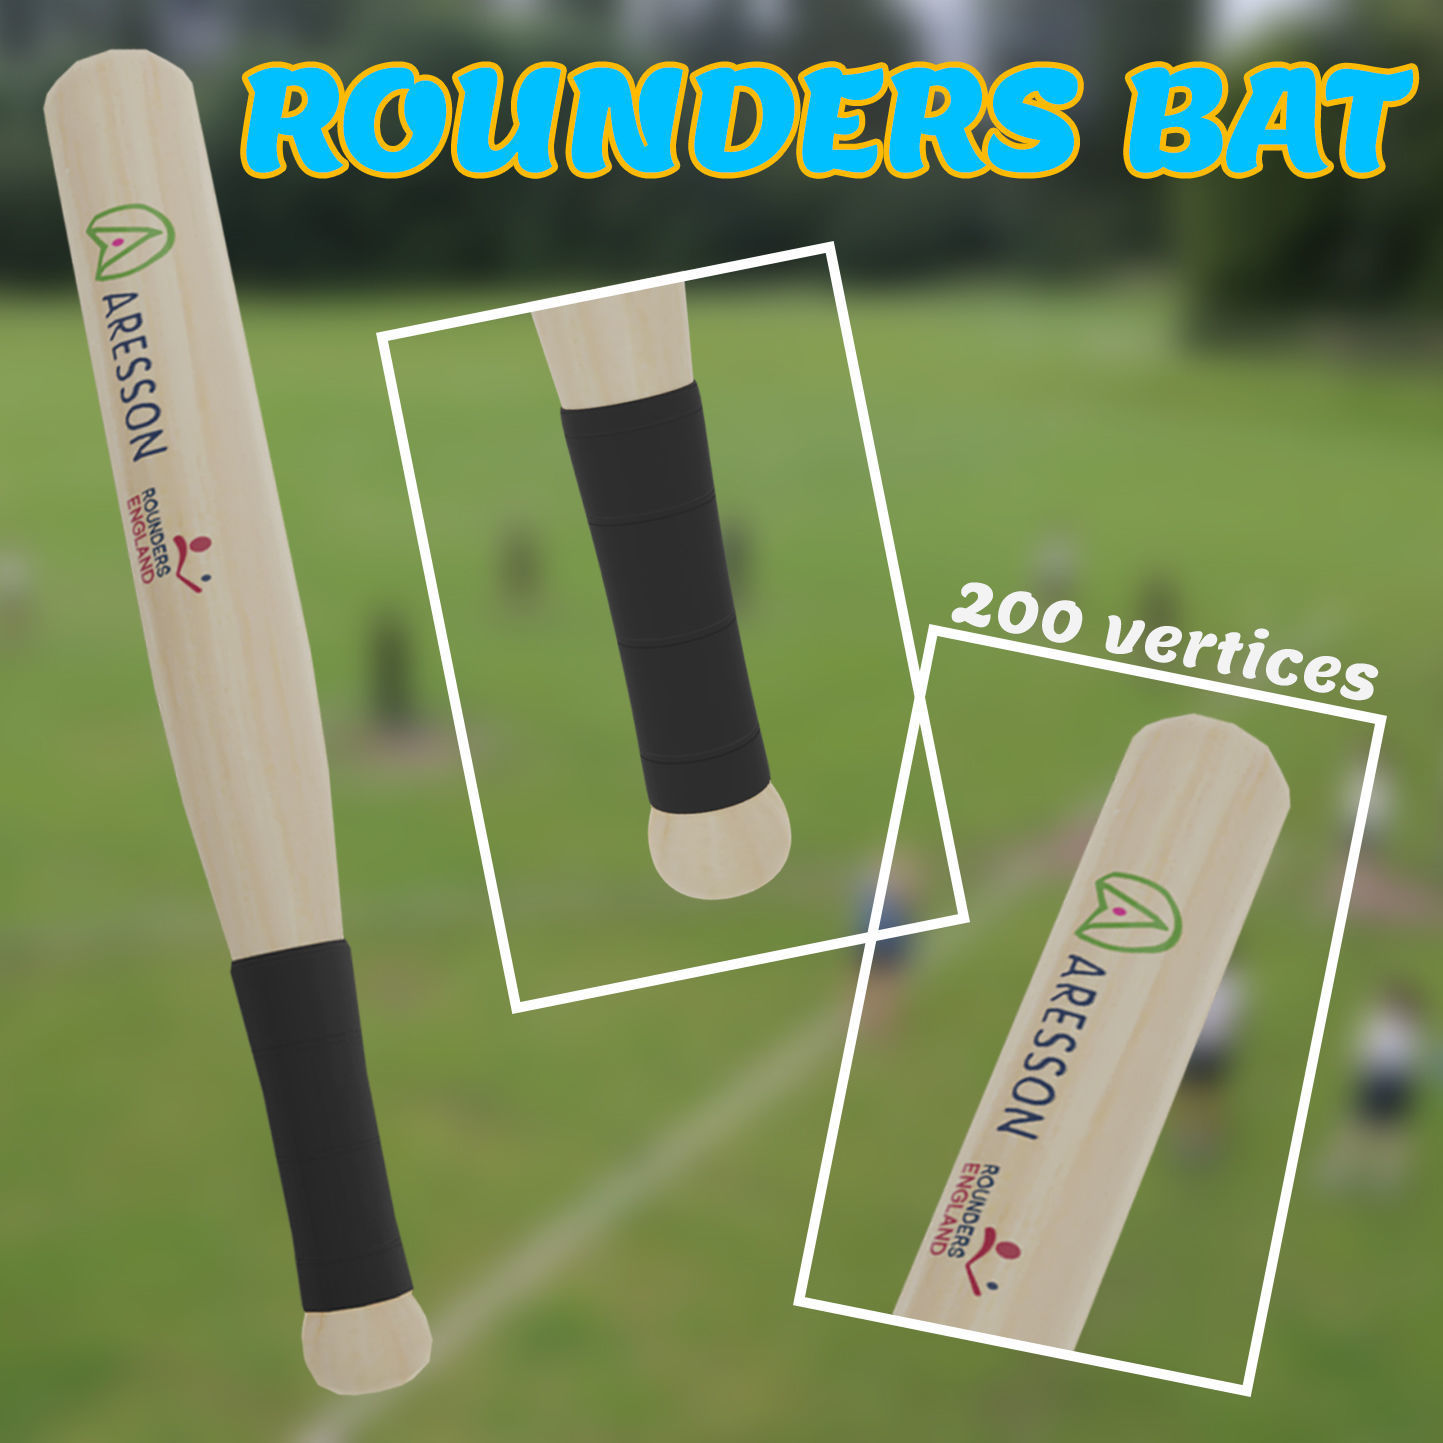 Rounders Bat